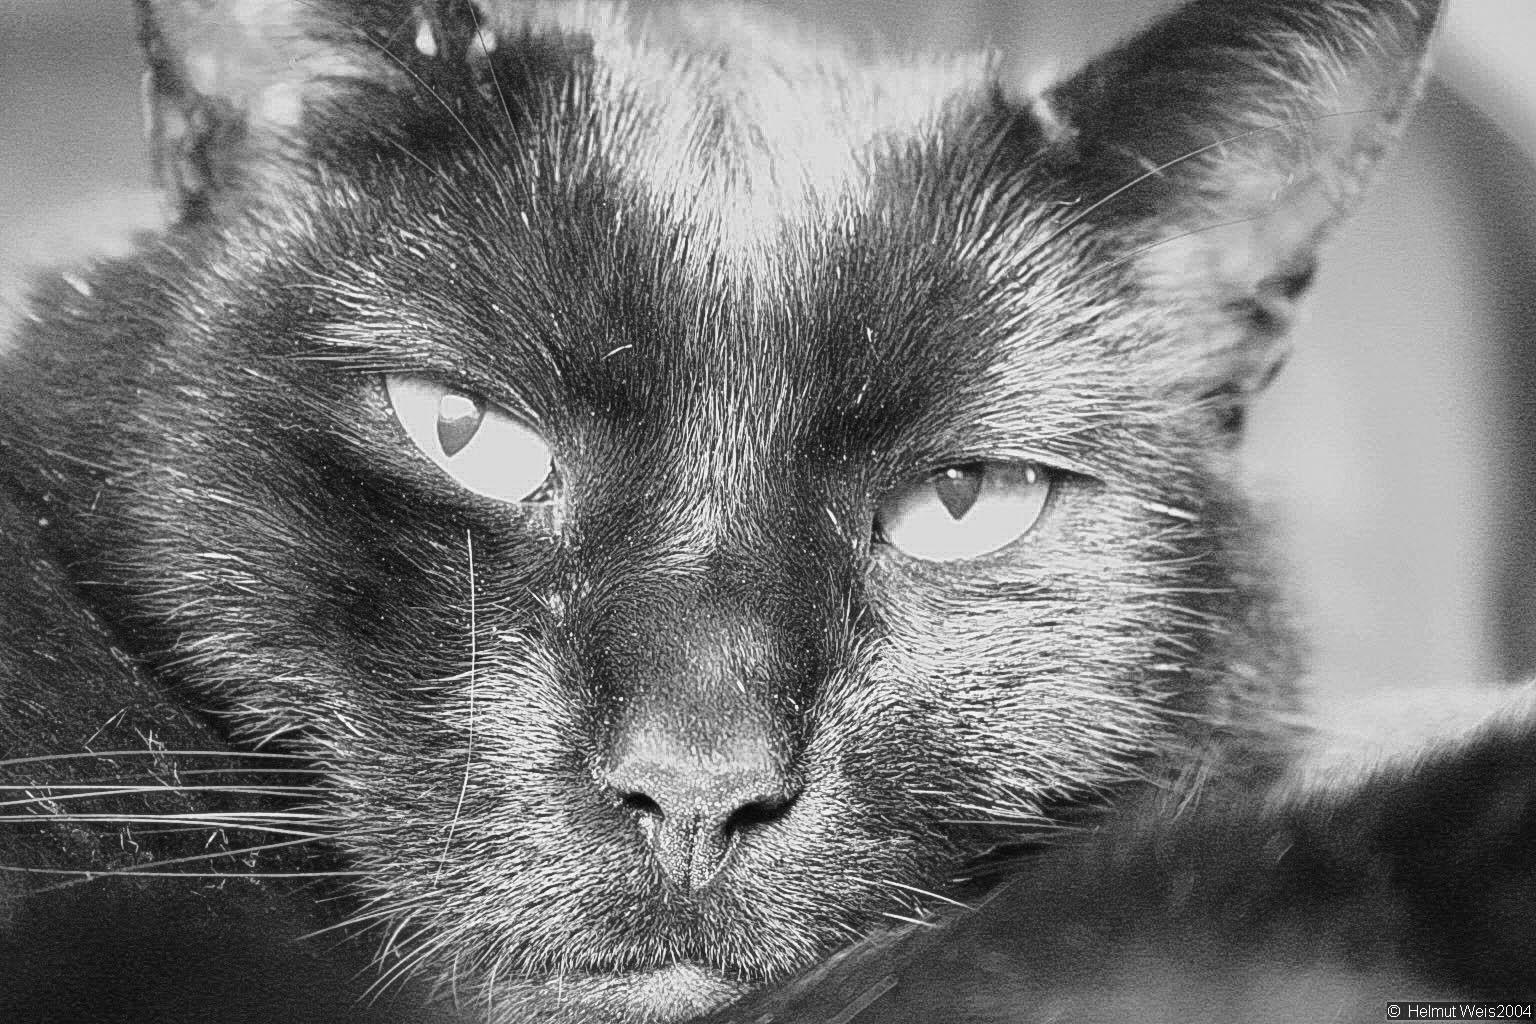 My Tom Cat Lefty